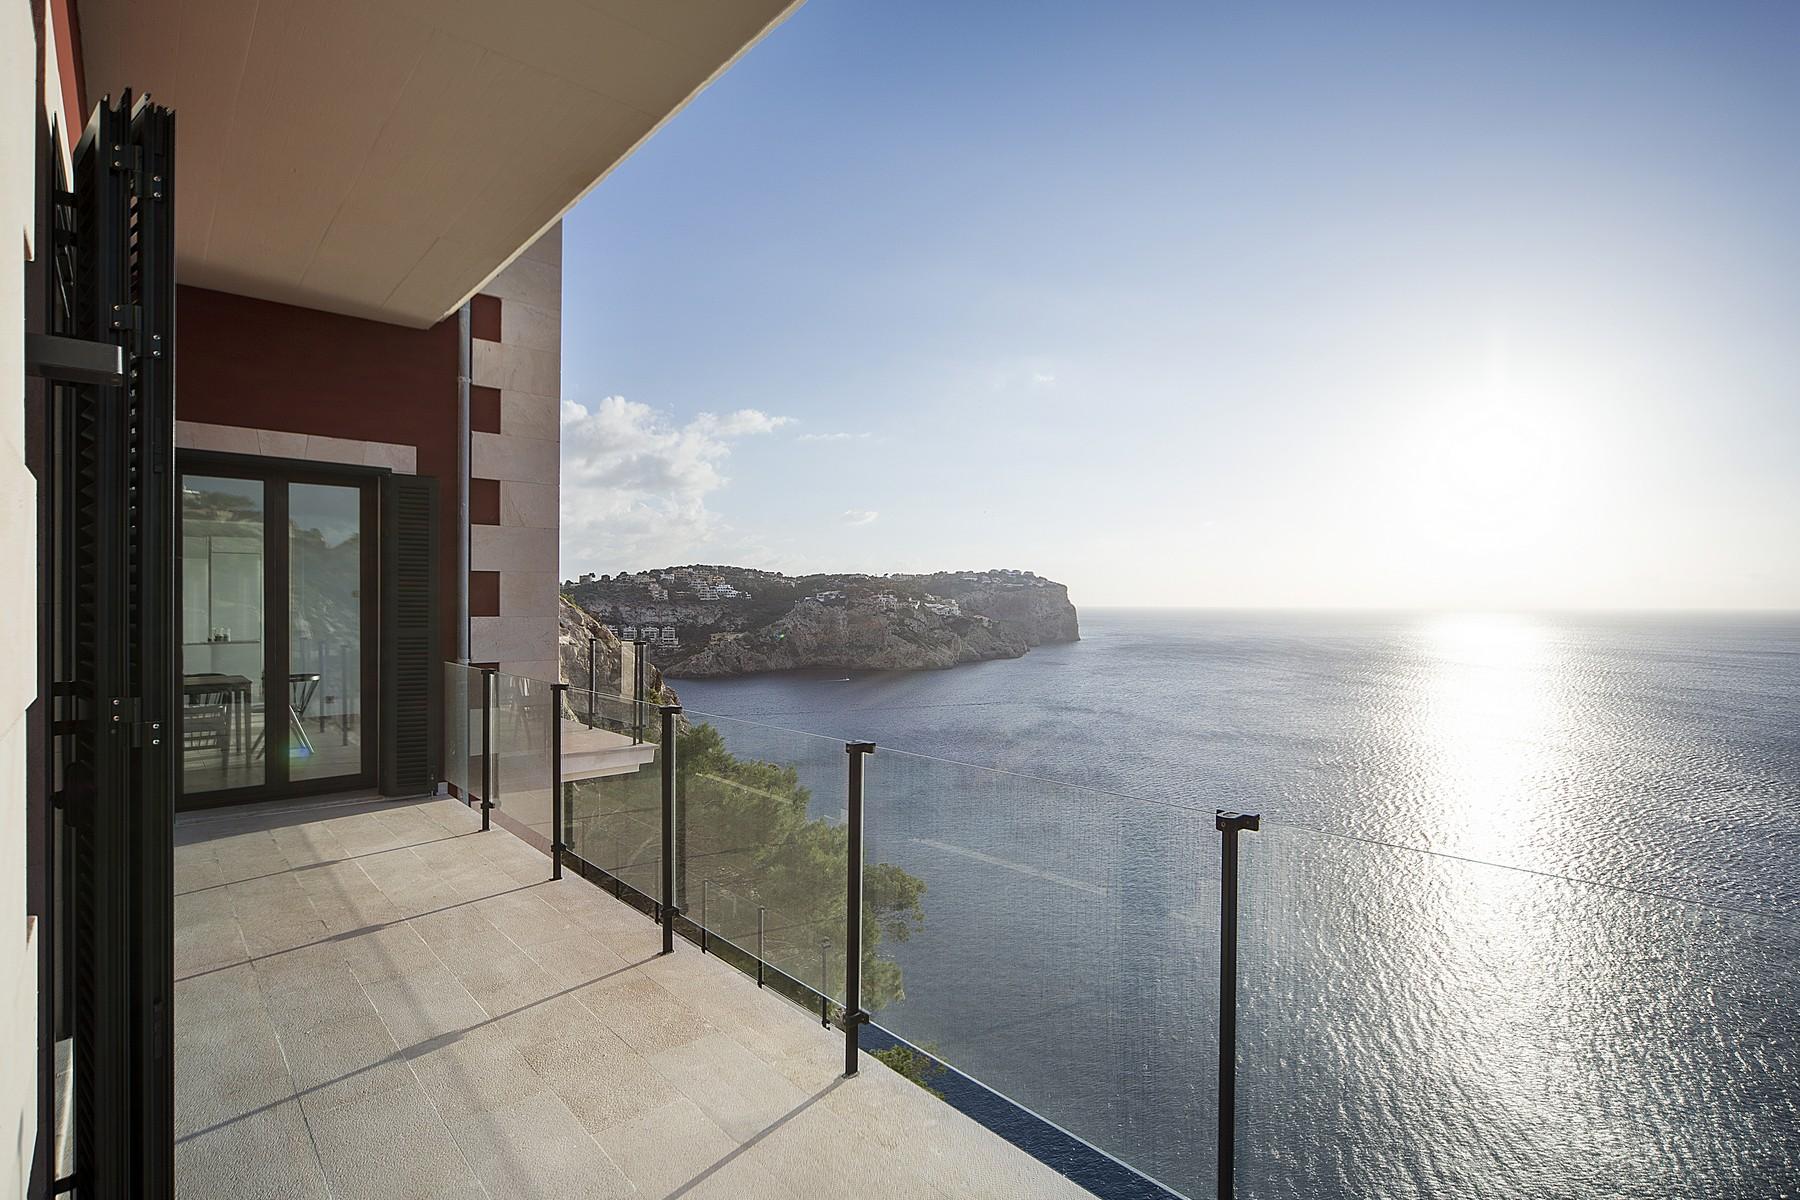 Single Family Home for Rent at Front line Villa in Port Andratx Port Andratx, Mallorca, 07013 Spain